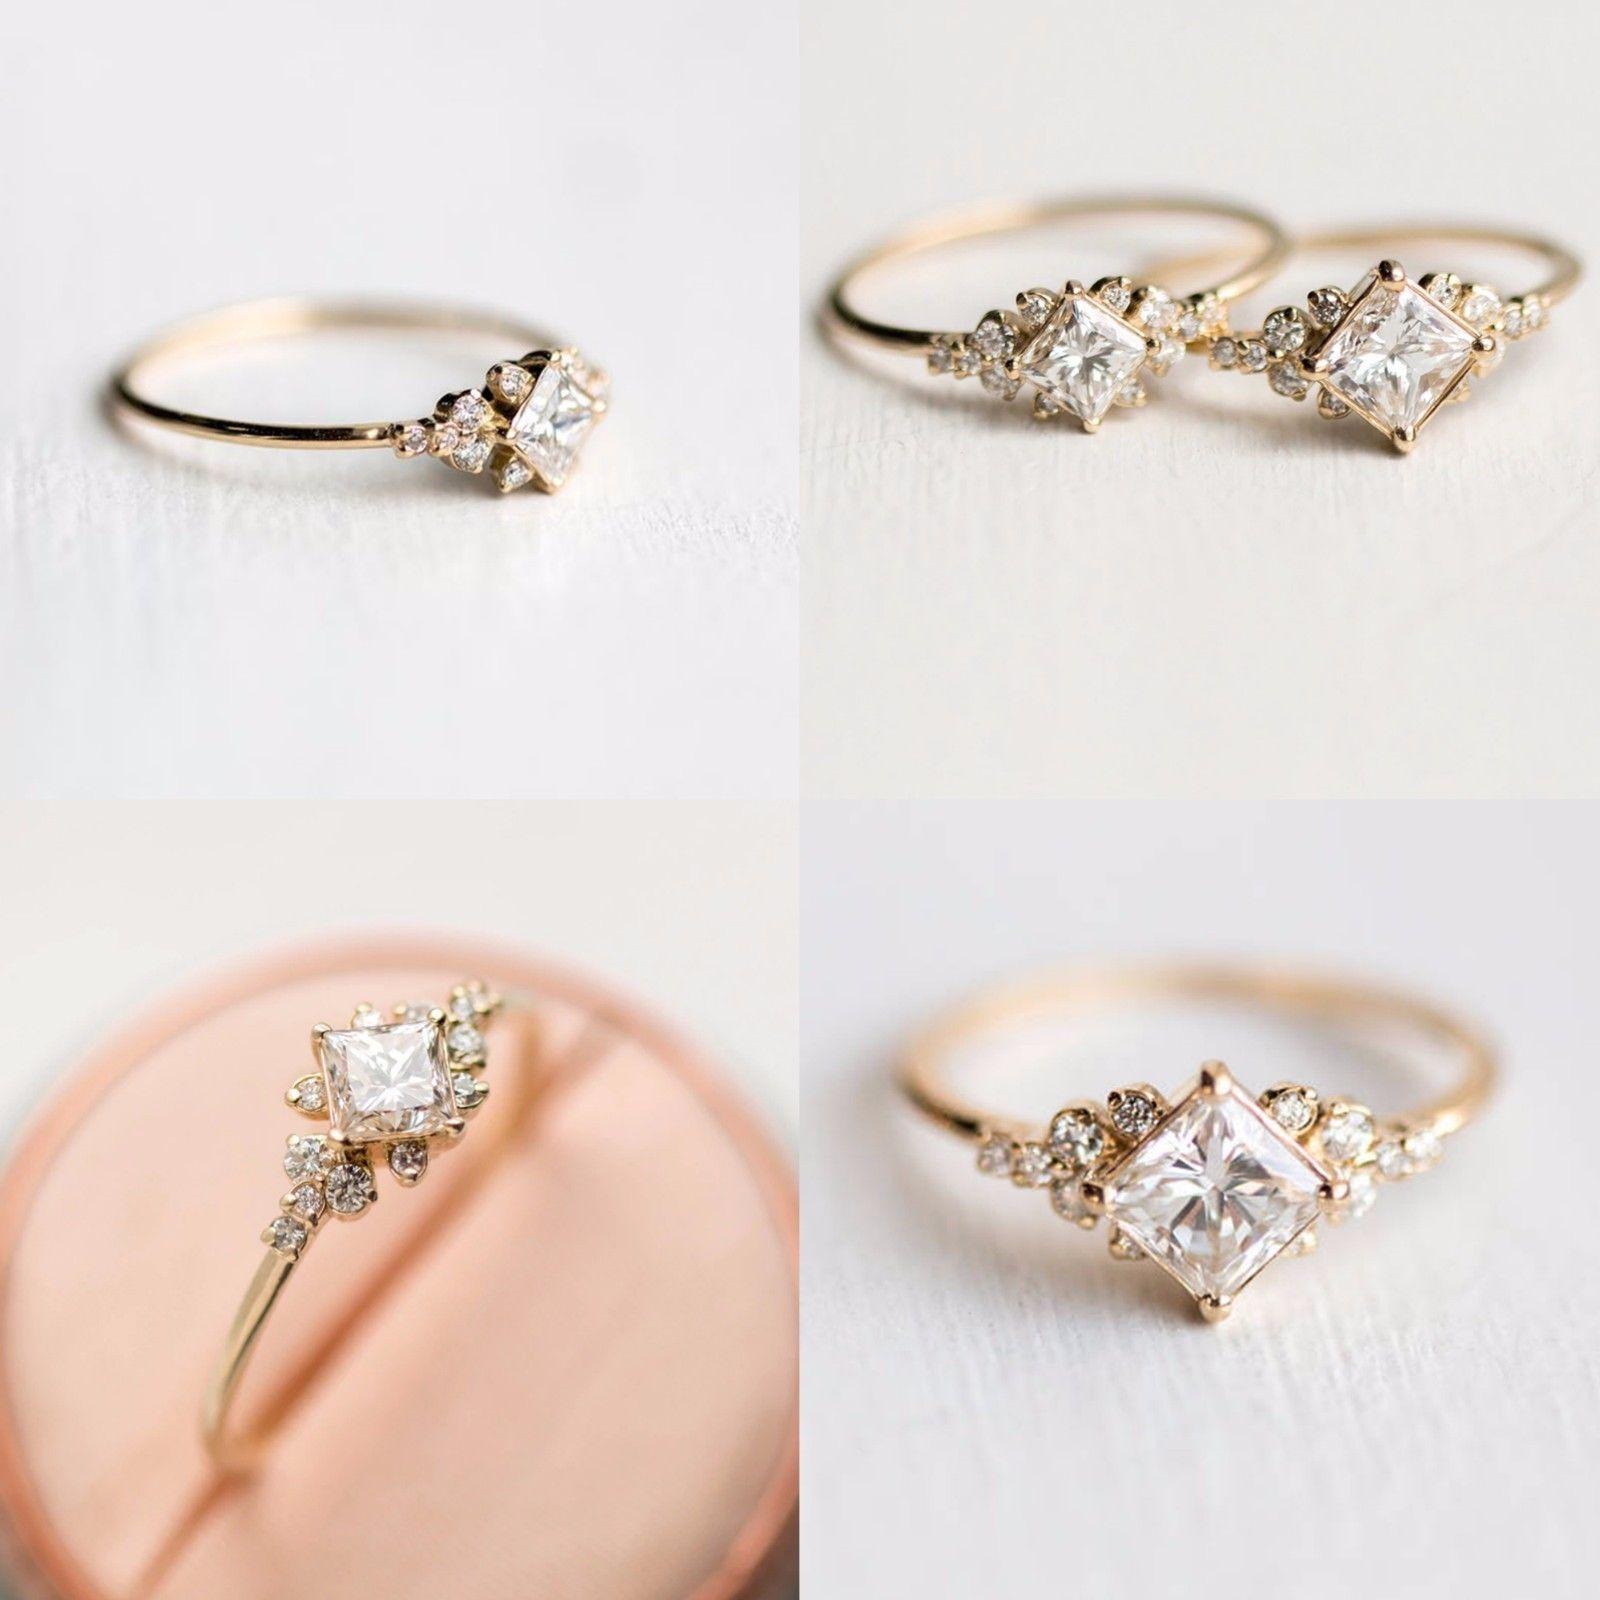 Fashion White Topaz 18K Yellow Gold Filled Wedding Engagement Ring Size 6-10